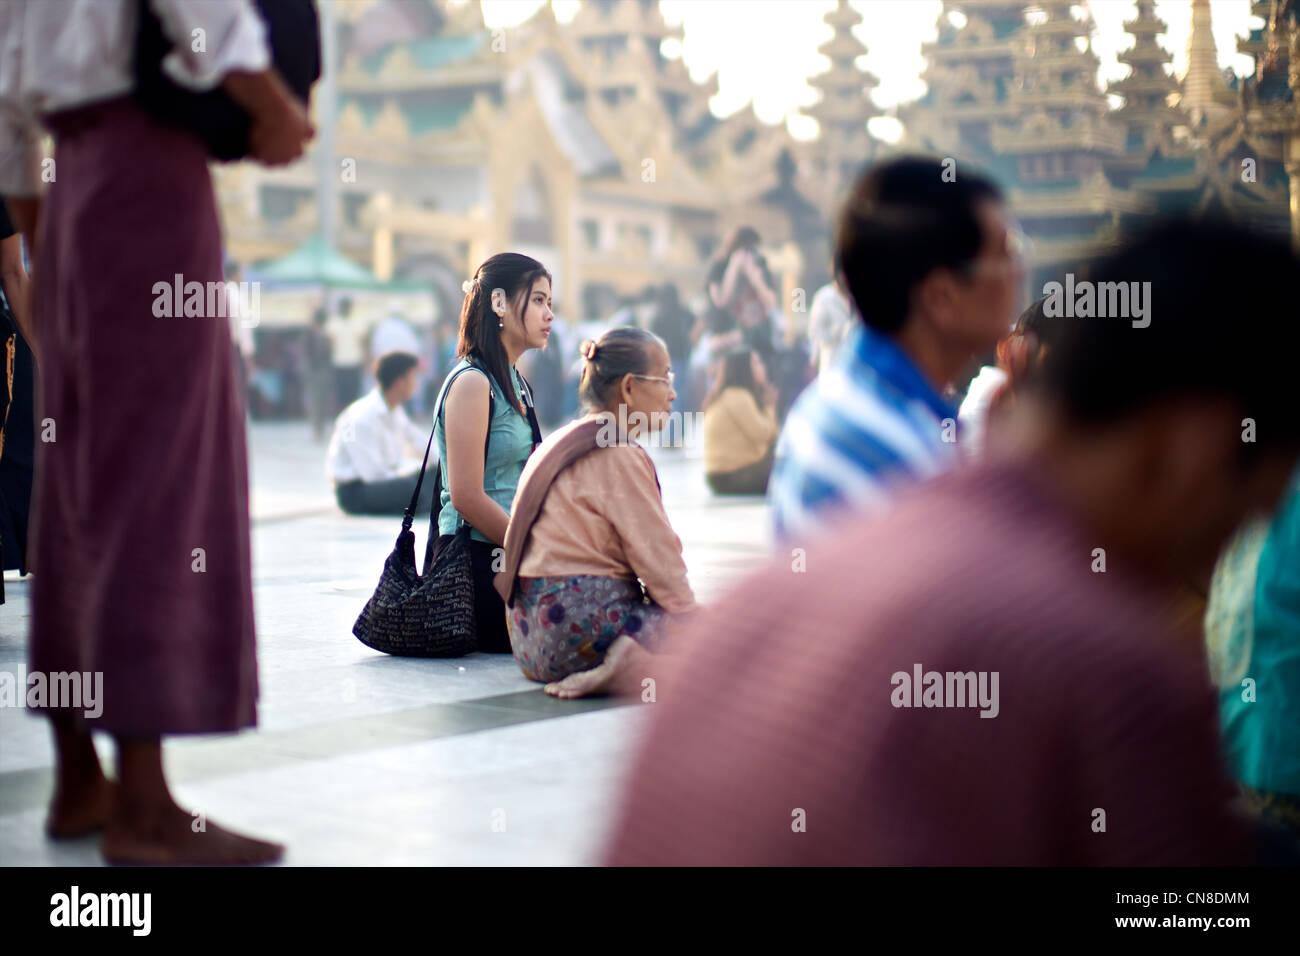 Burmese women pray in at the sacred Buddhist site of Shwedagon Paya, Yangon (Rangoon), Myanmar (Burma) - Stock Image